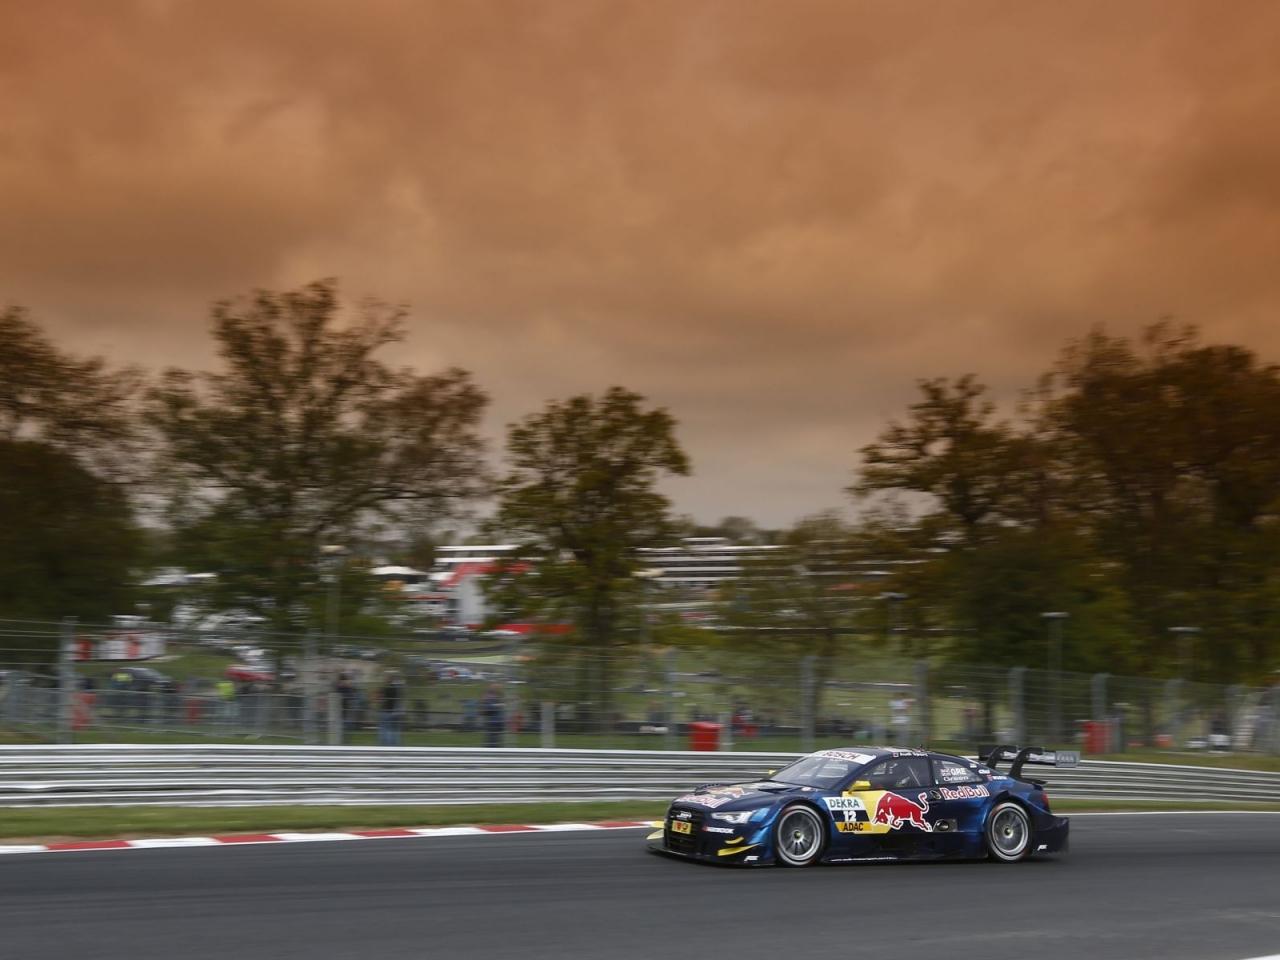 Audi racing - 1280x960